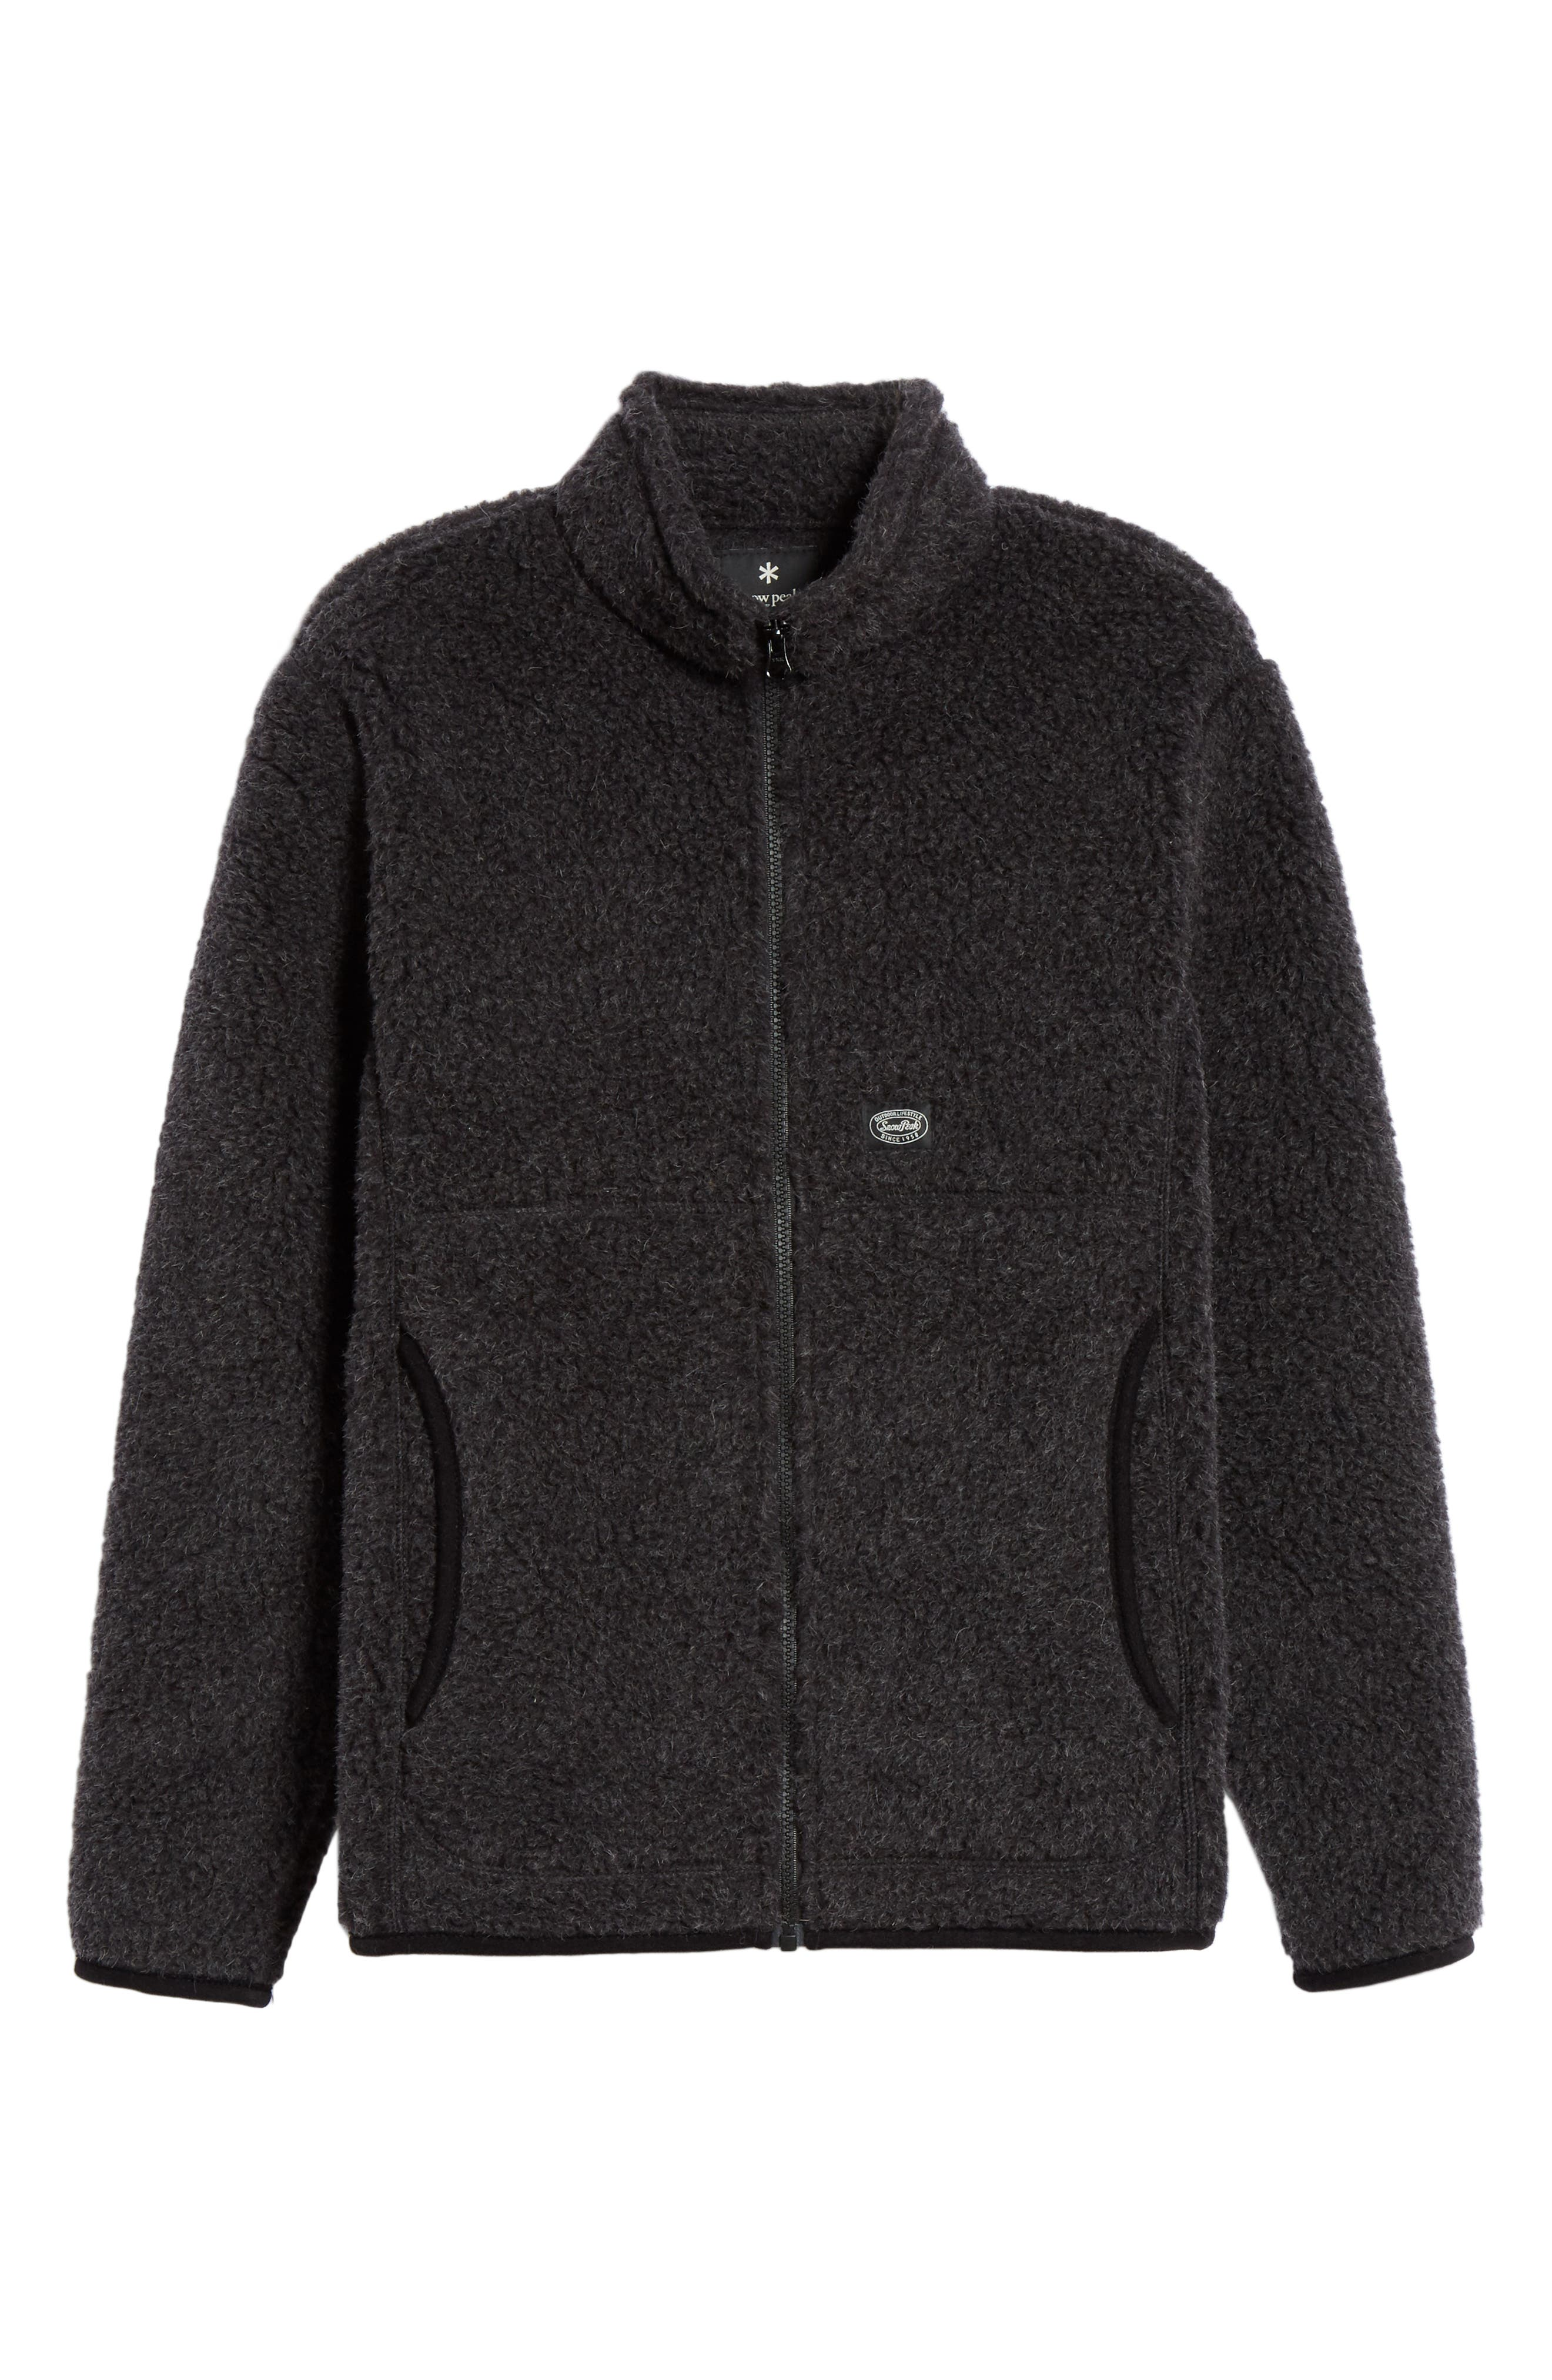 Snow Peak Wool Fleece Jacket, Black